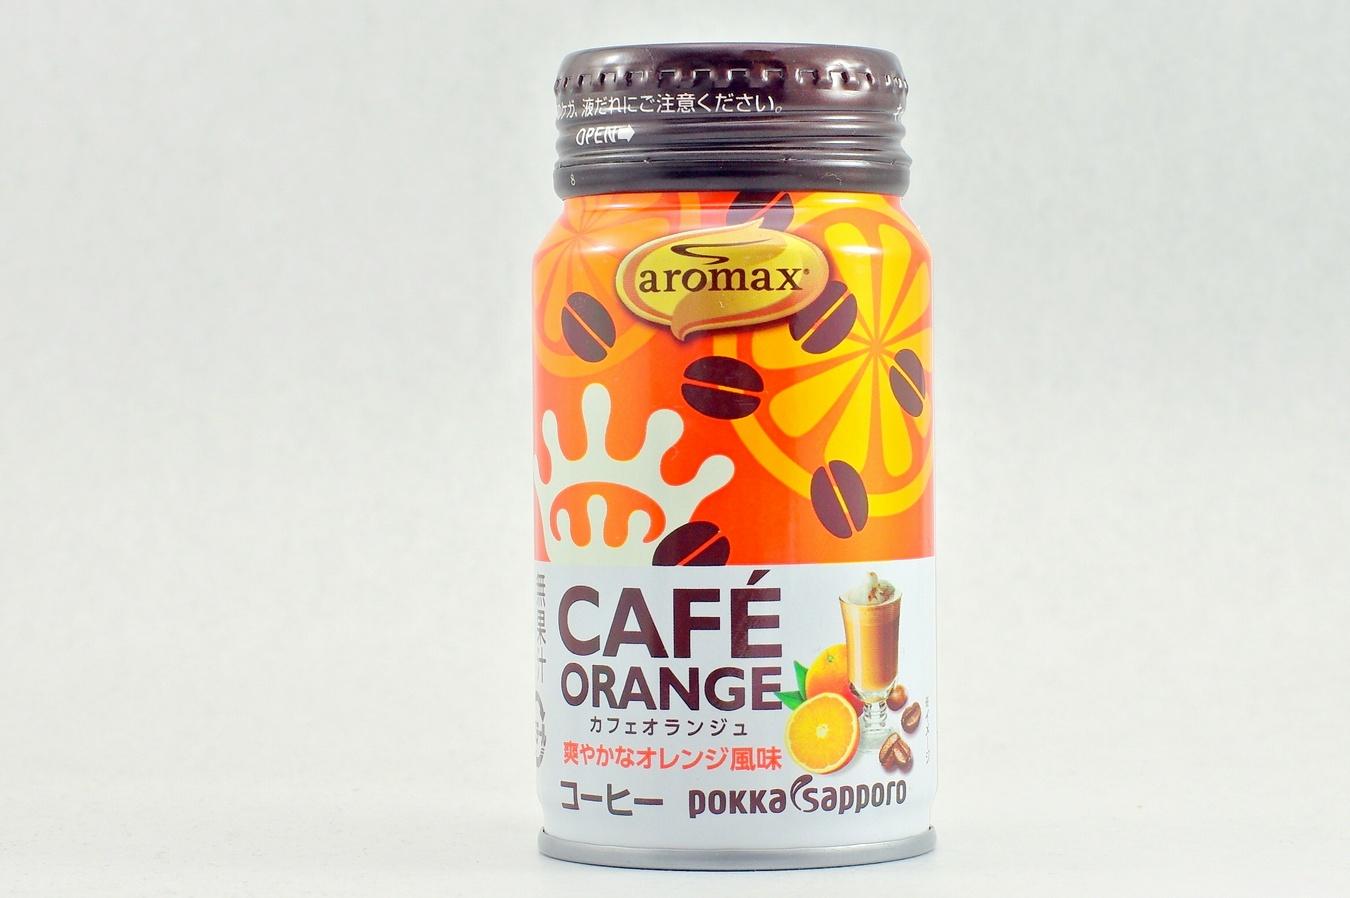 aromax カフェオランジュ 2015年4月